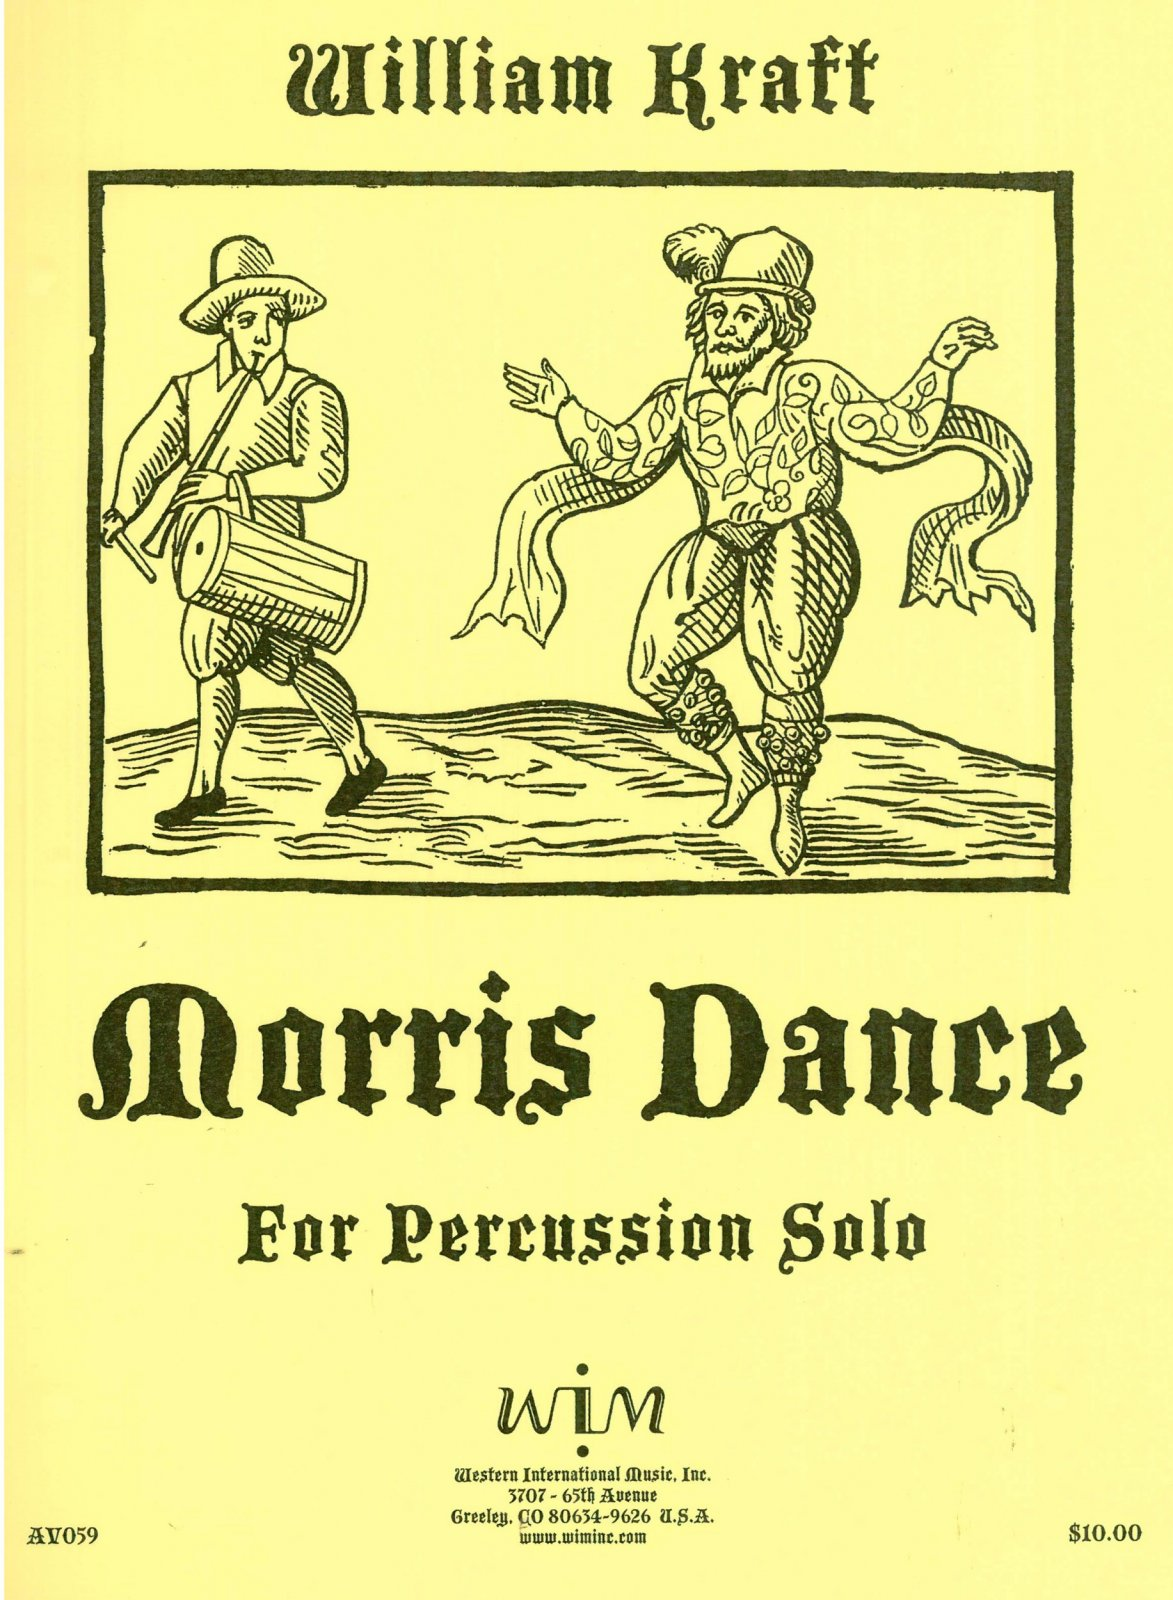 Kraft, William: Morris Dance for Percussion Solo